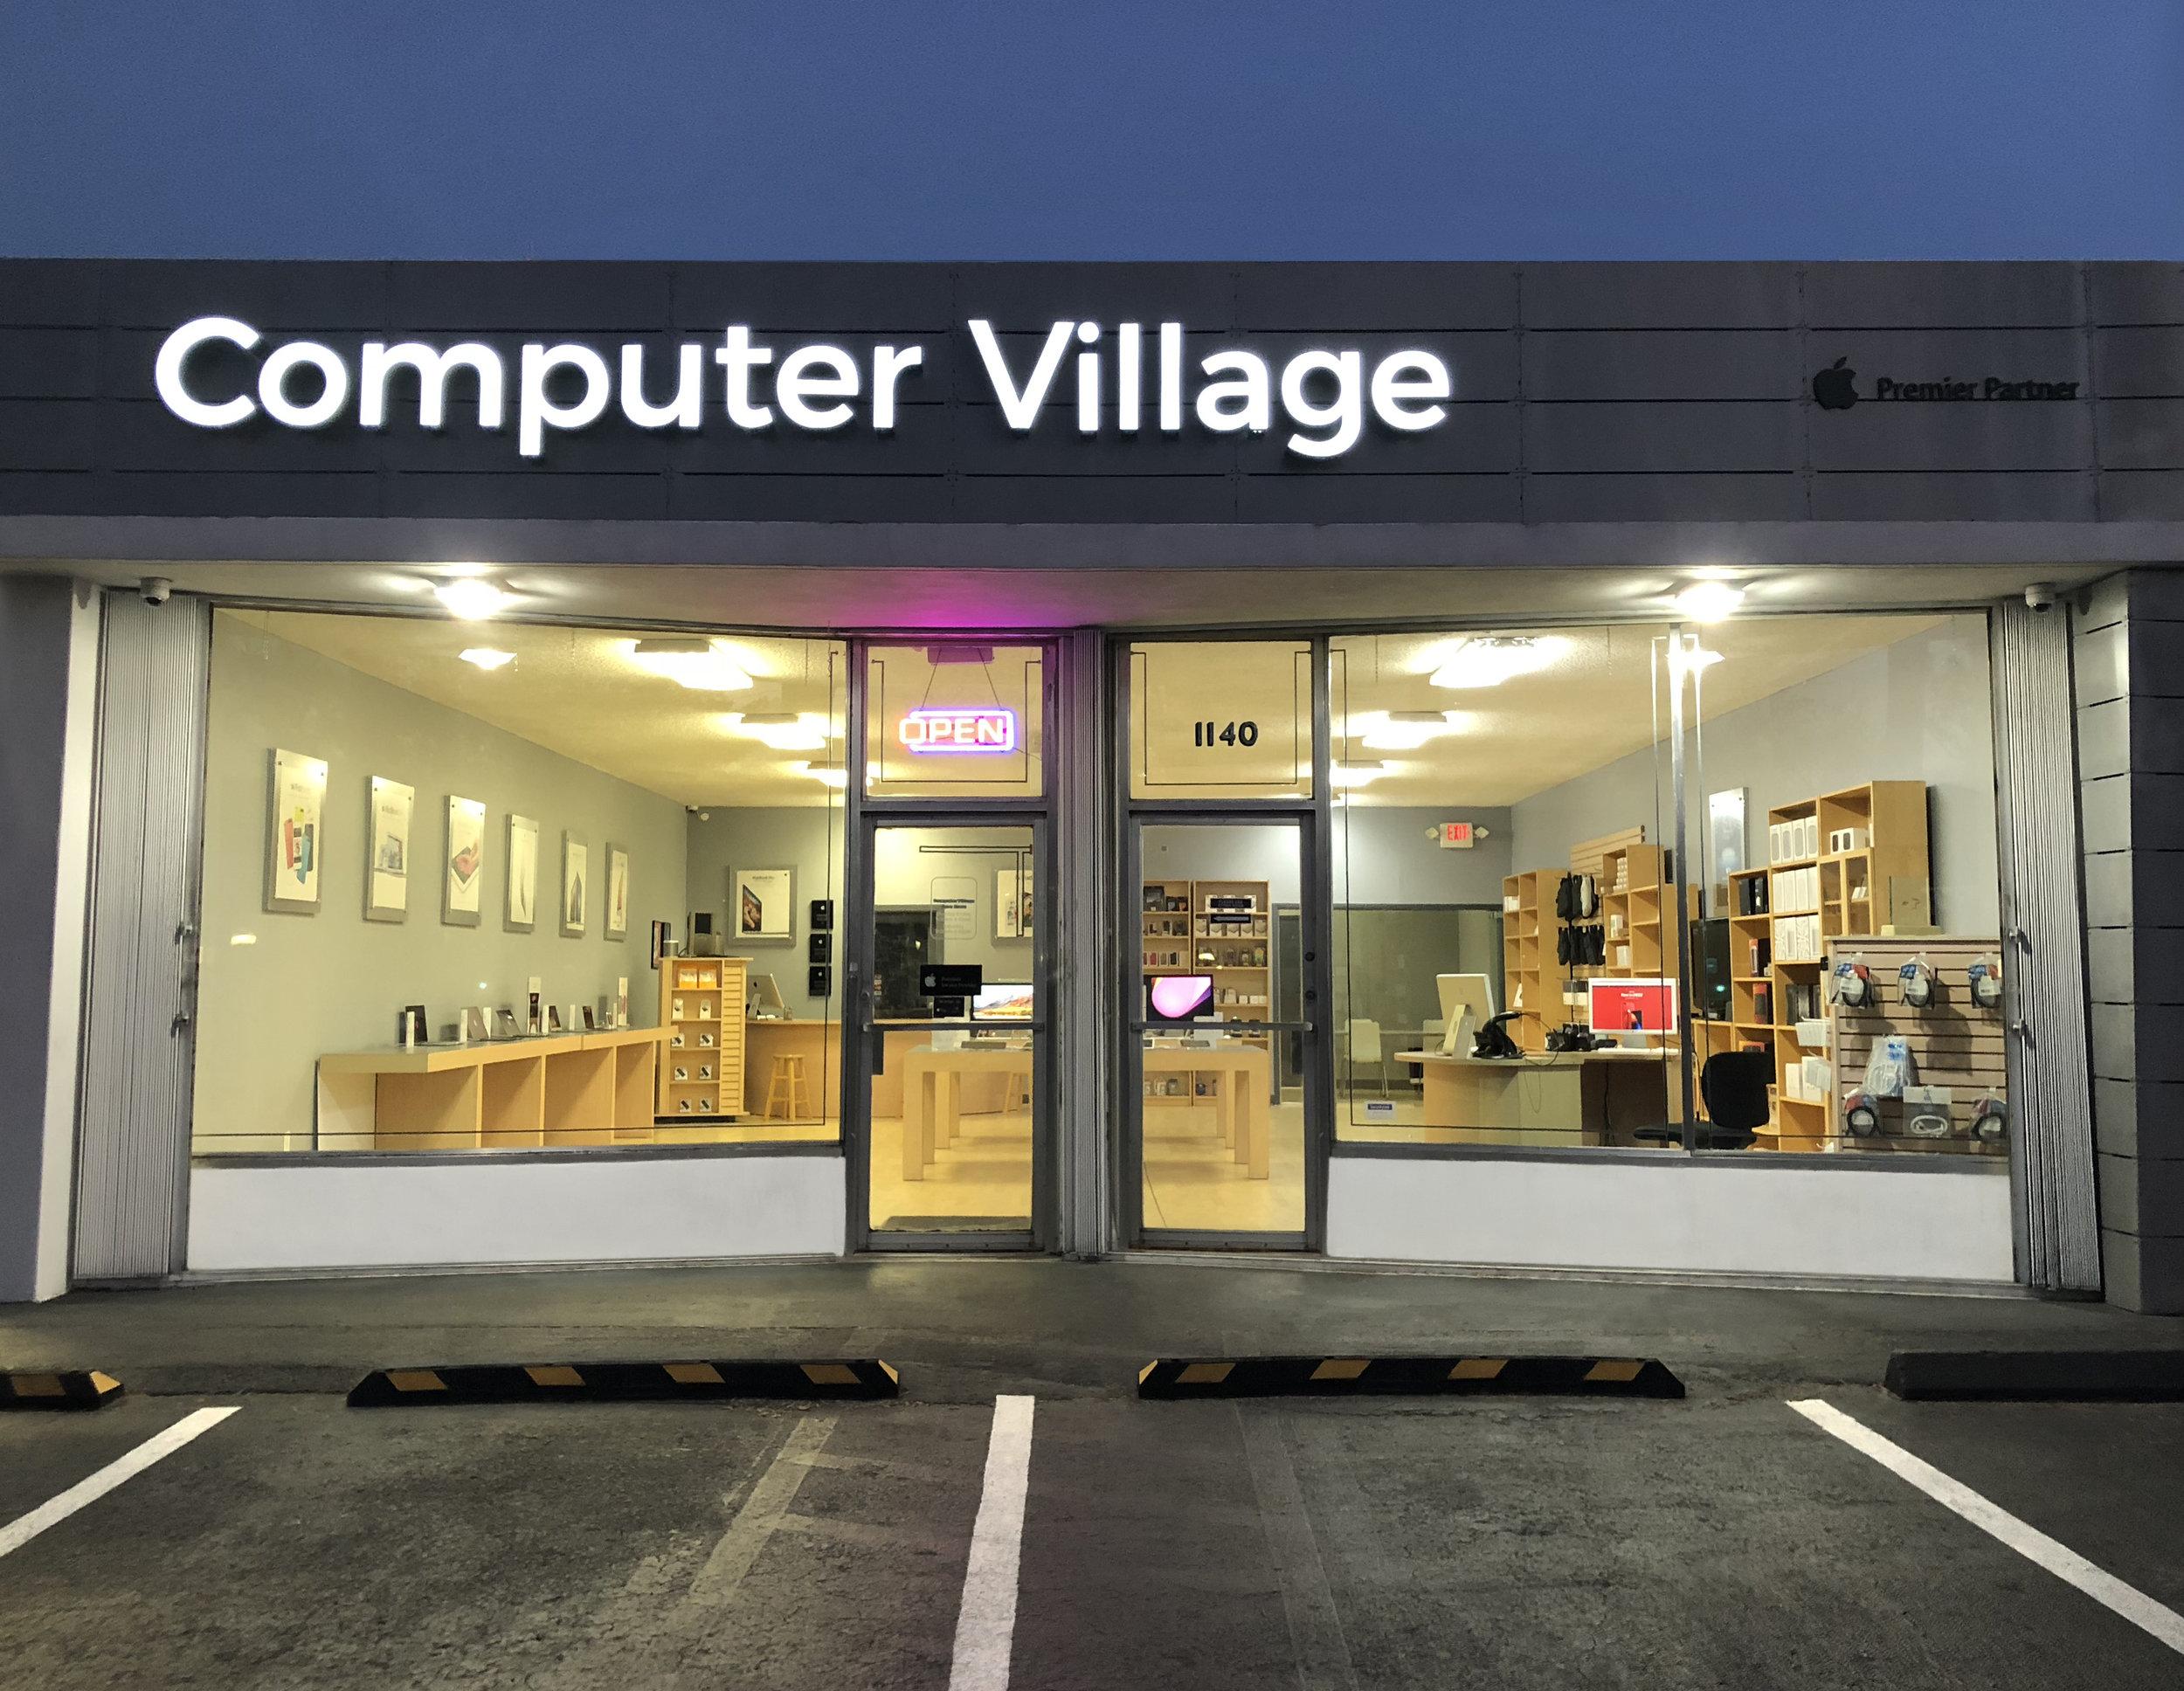 Retouch 001 Computer Village Flat 2-2.jpg